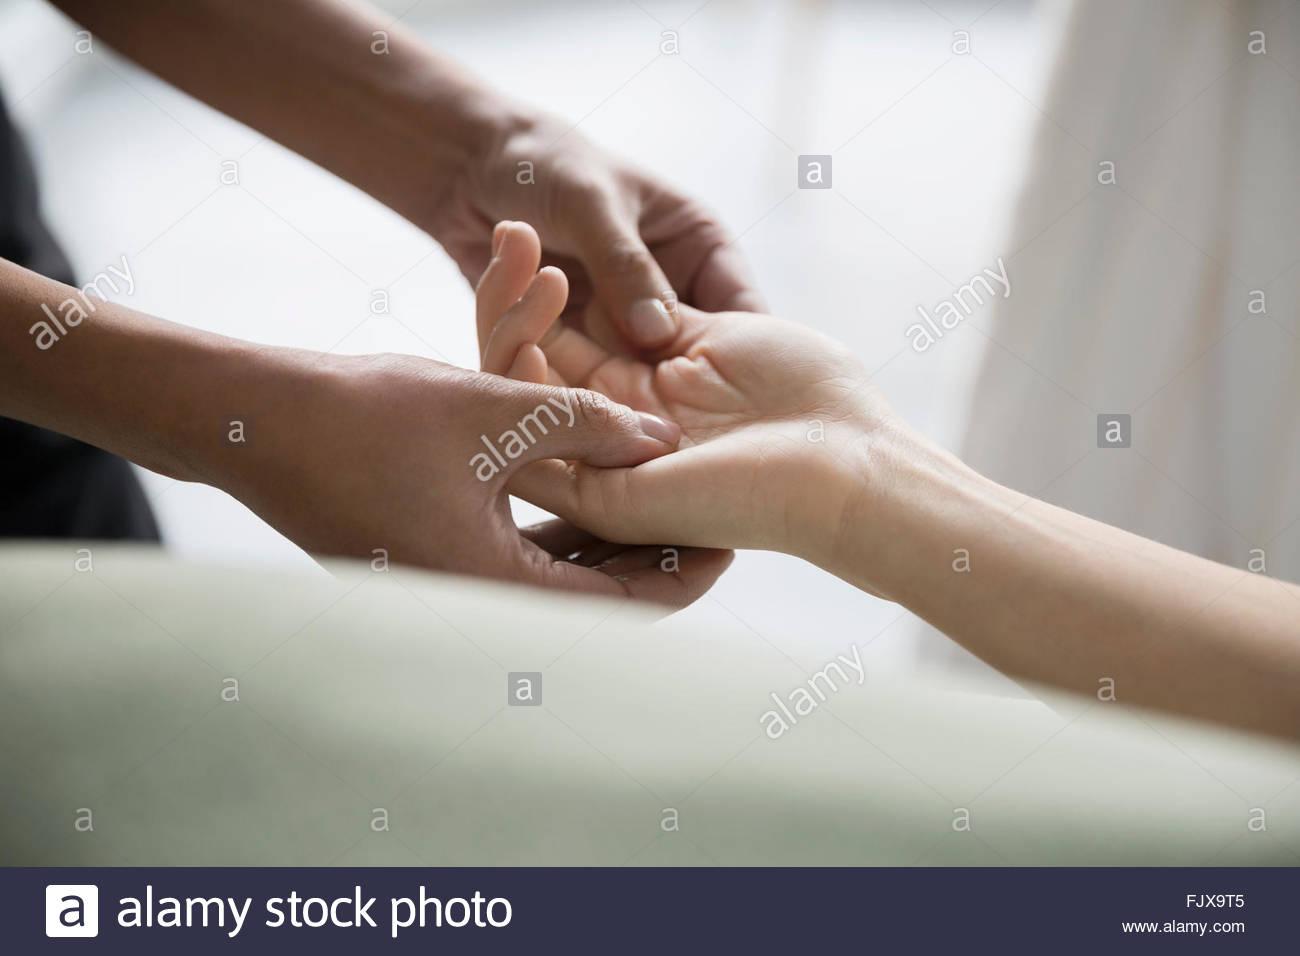 Woman receiving hand massage - Stock Image